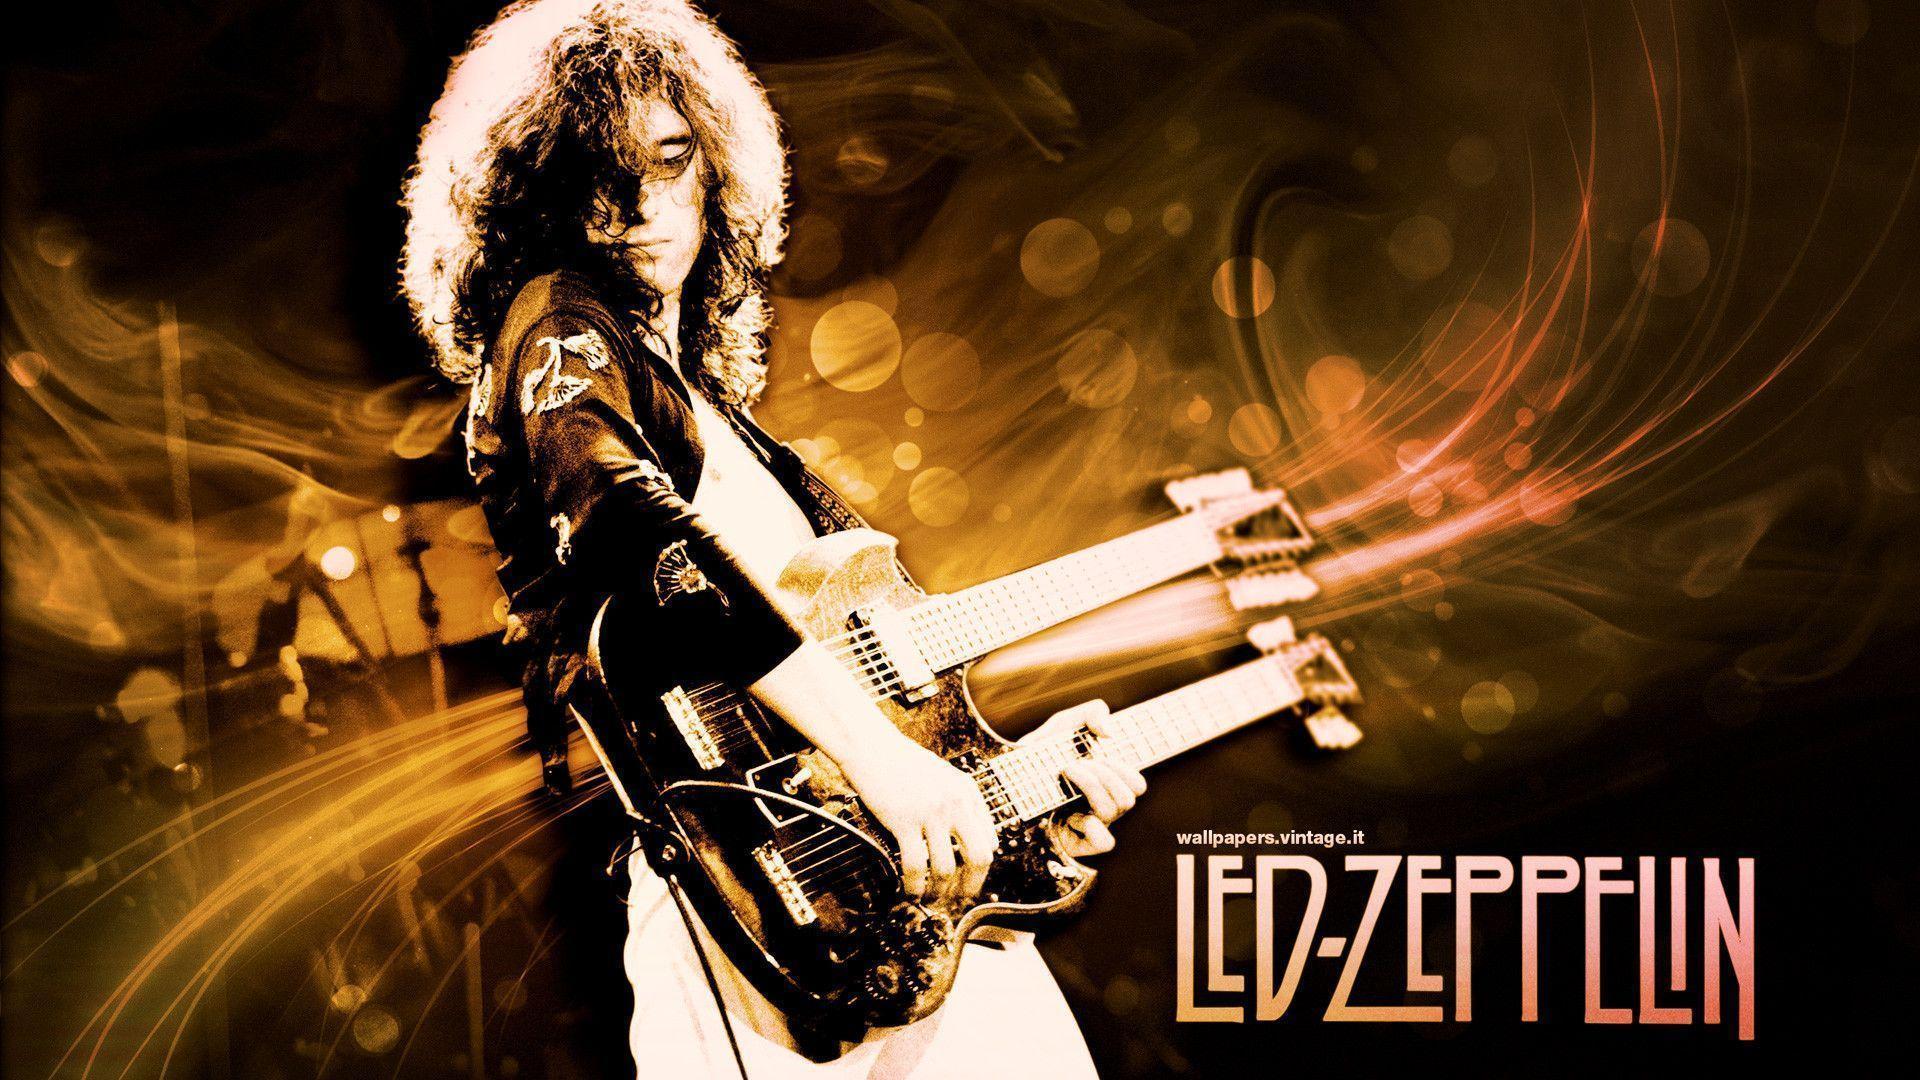 Led Zeppelin Backgrounds Wallpaper Cave